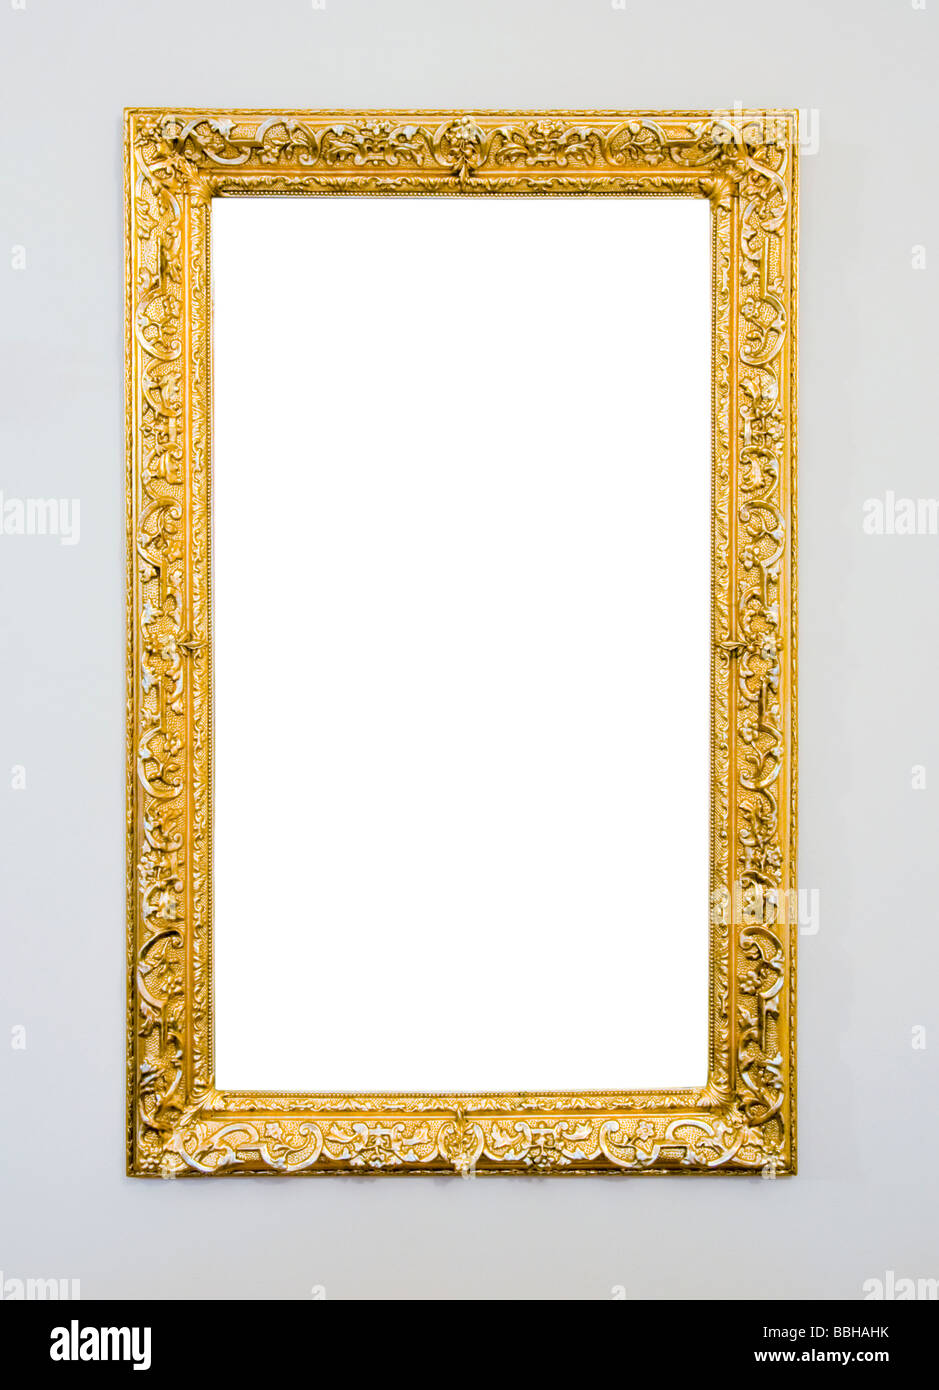 Antike Bilderrahmen Stockfoto, Bild: 24353103 - Alamy